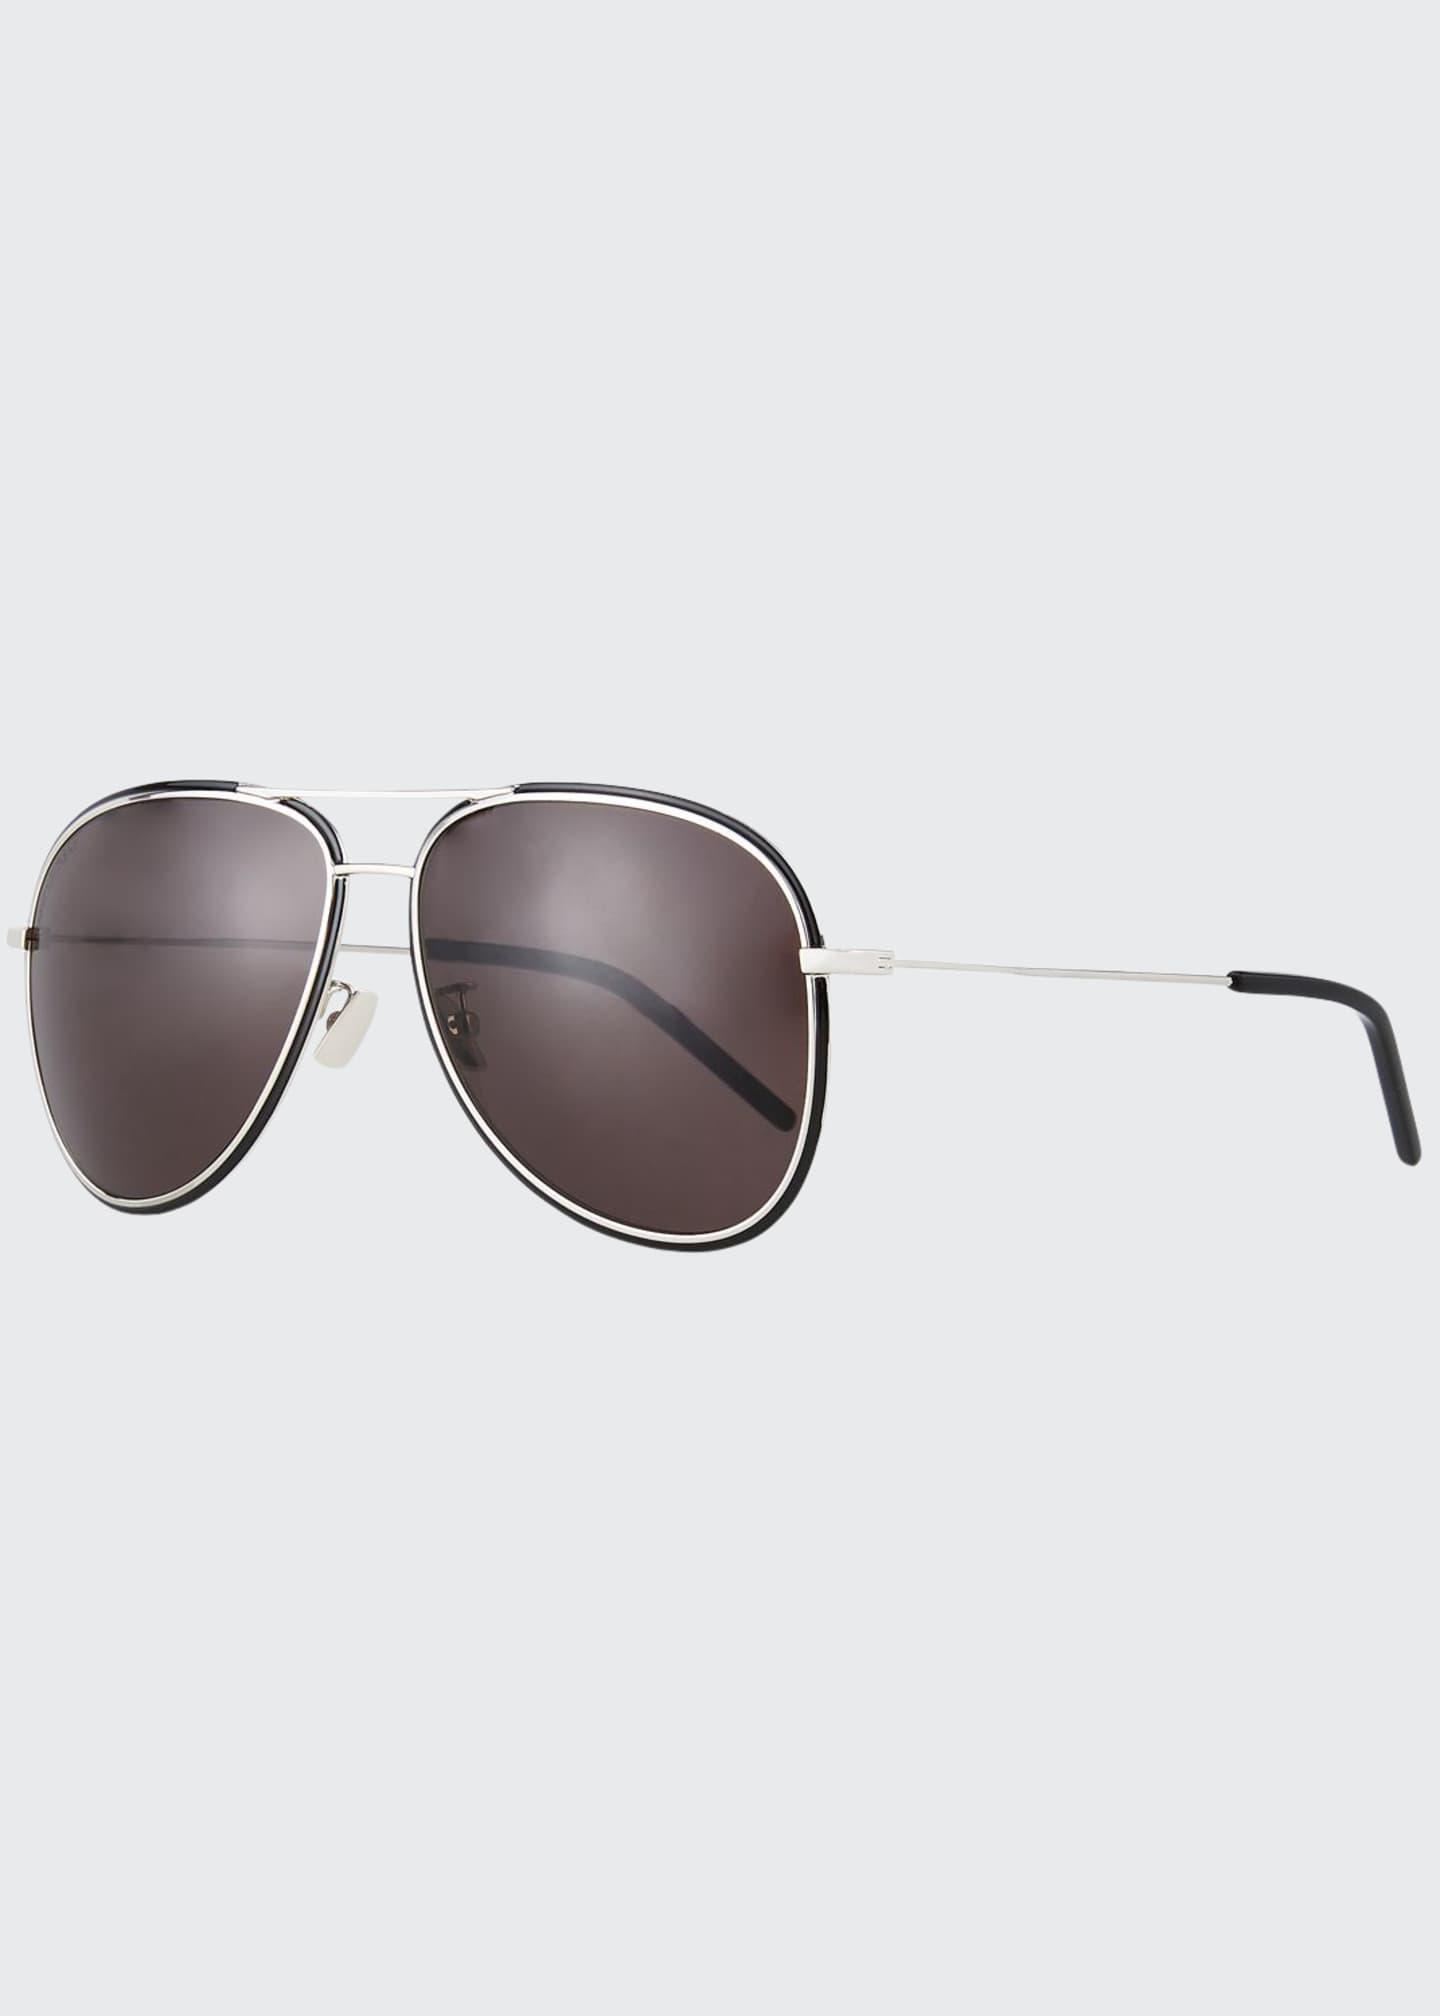 Saint Laurent Men's SL 294F Metal Aviator Sunglasses